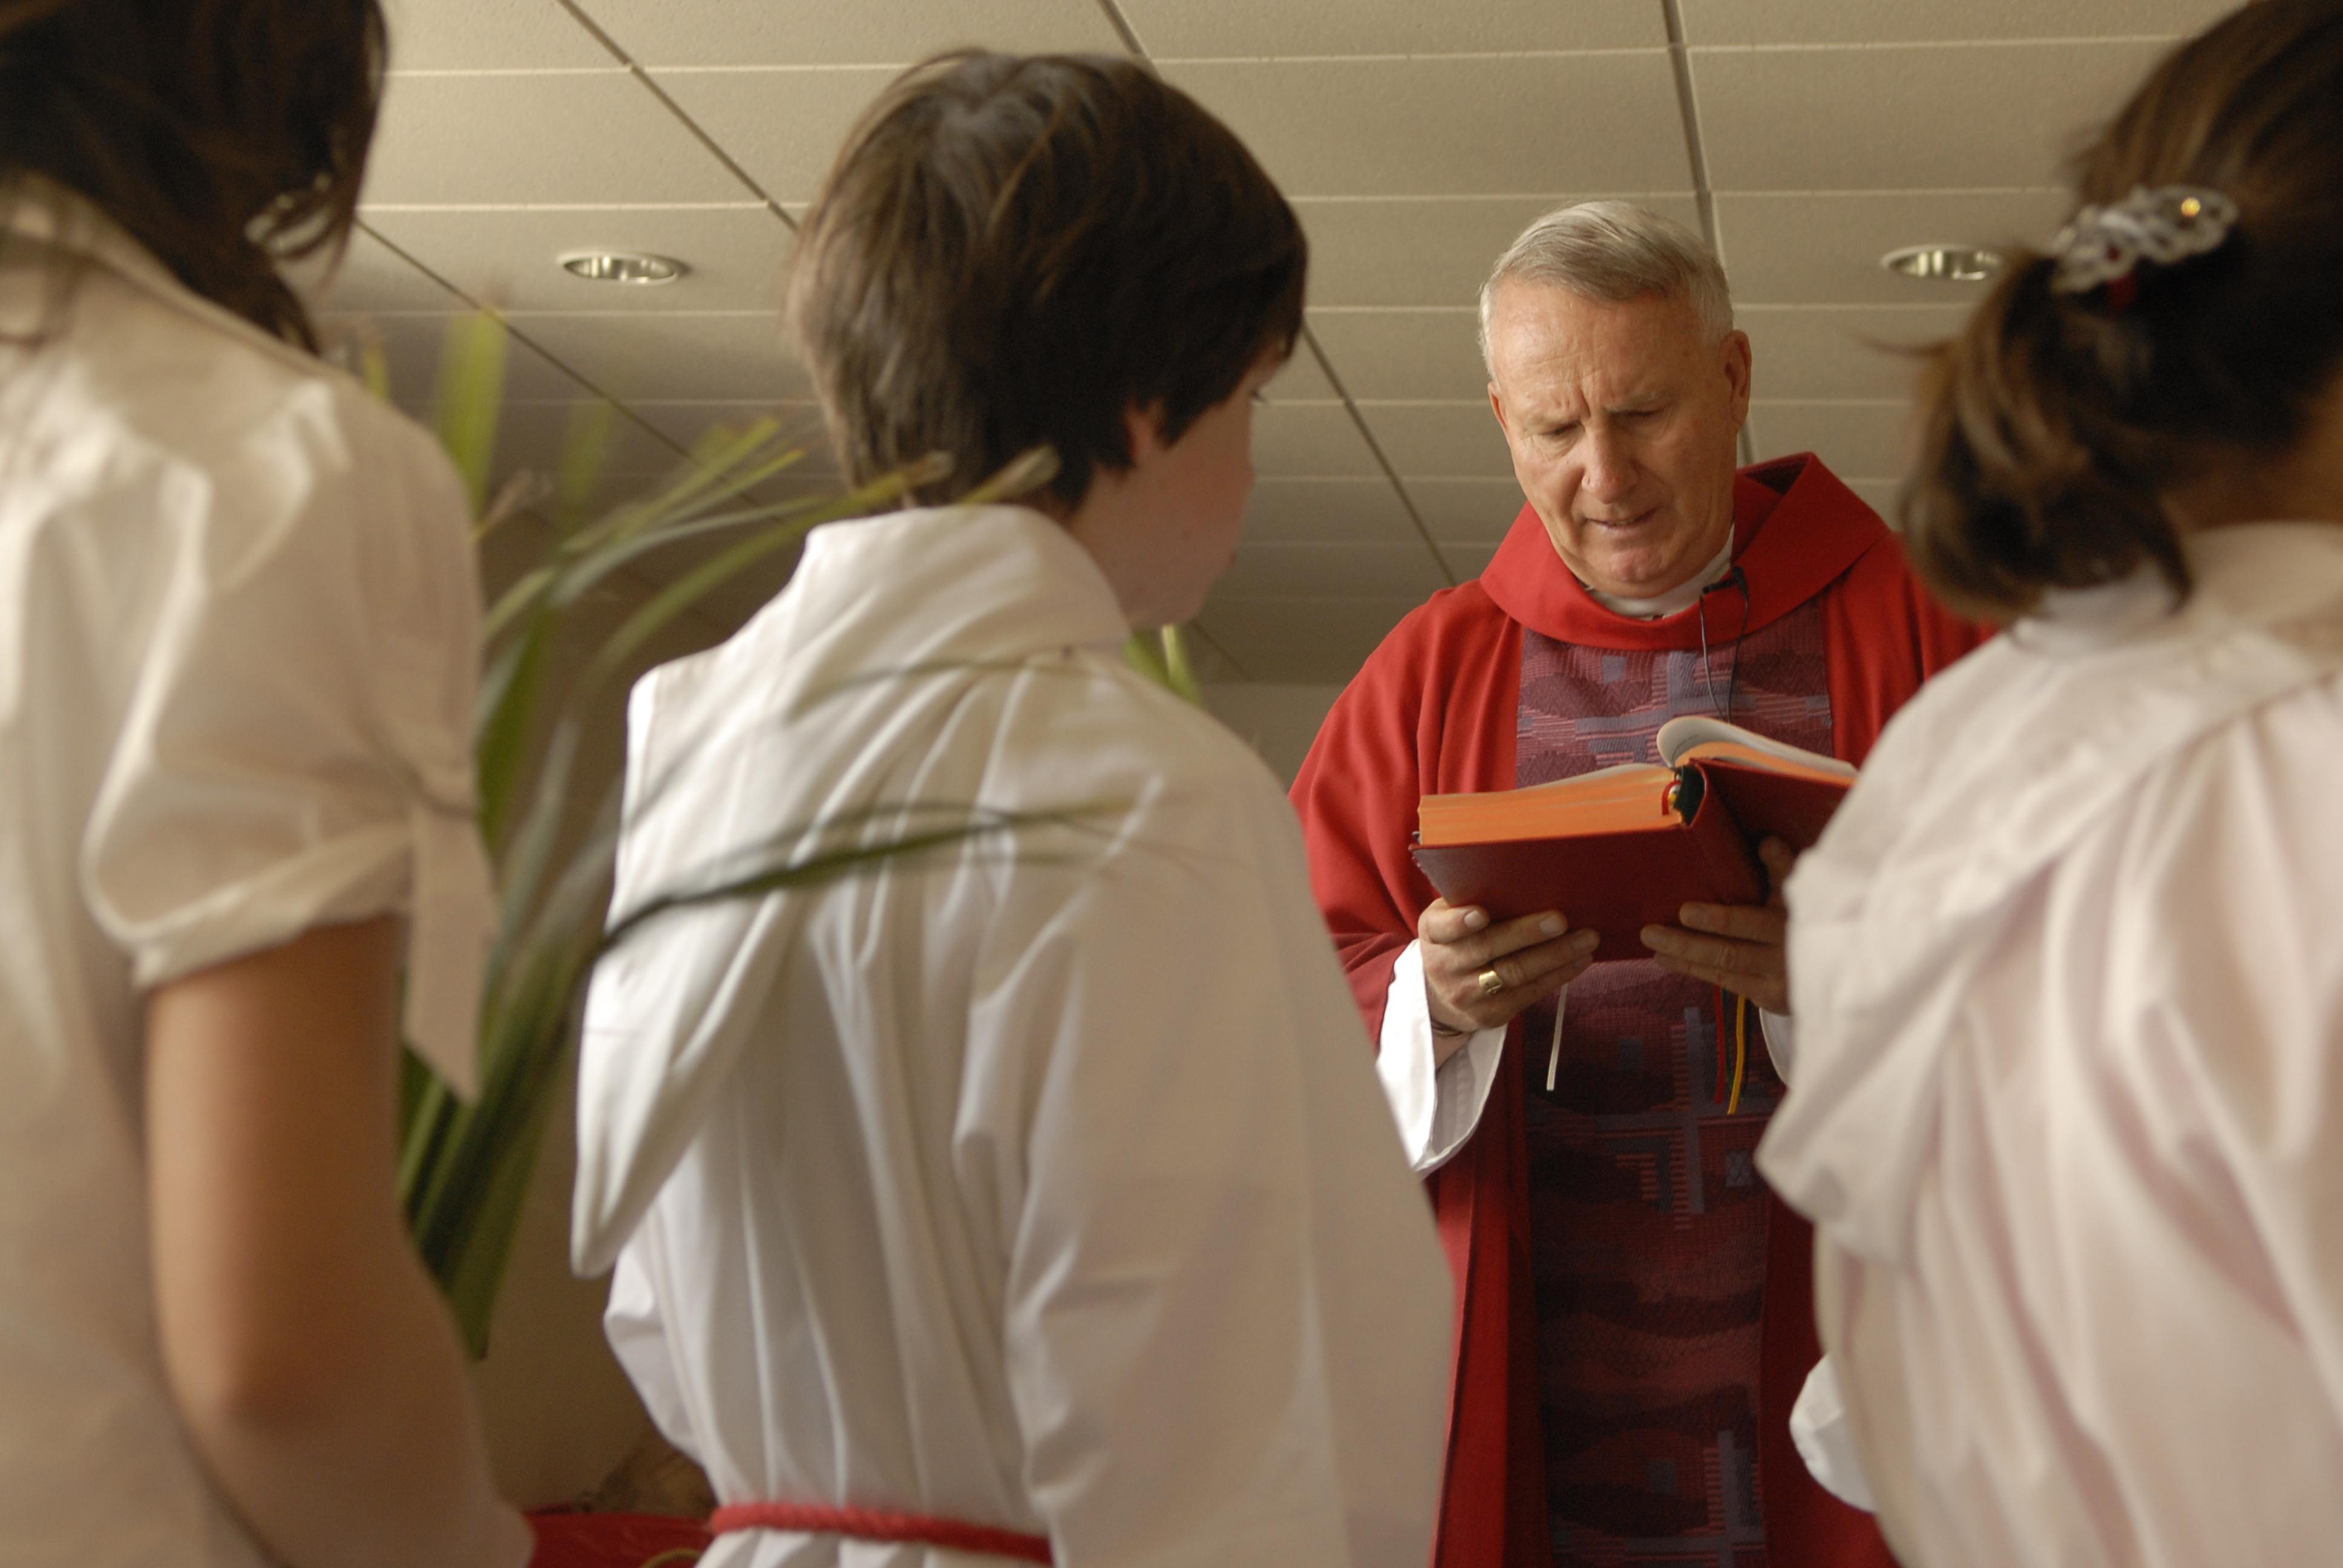 Catholic Priest and Children